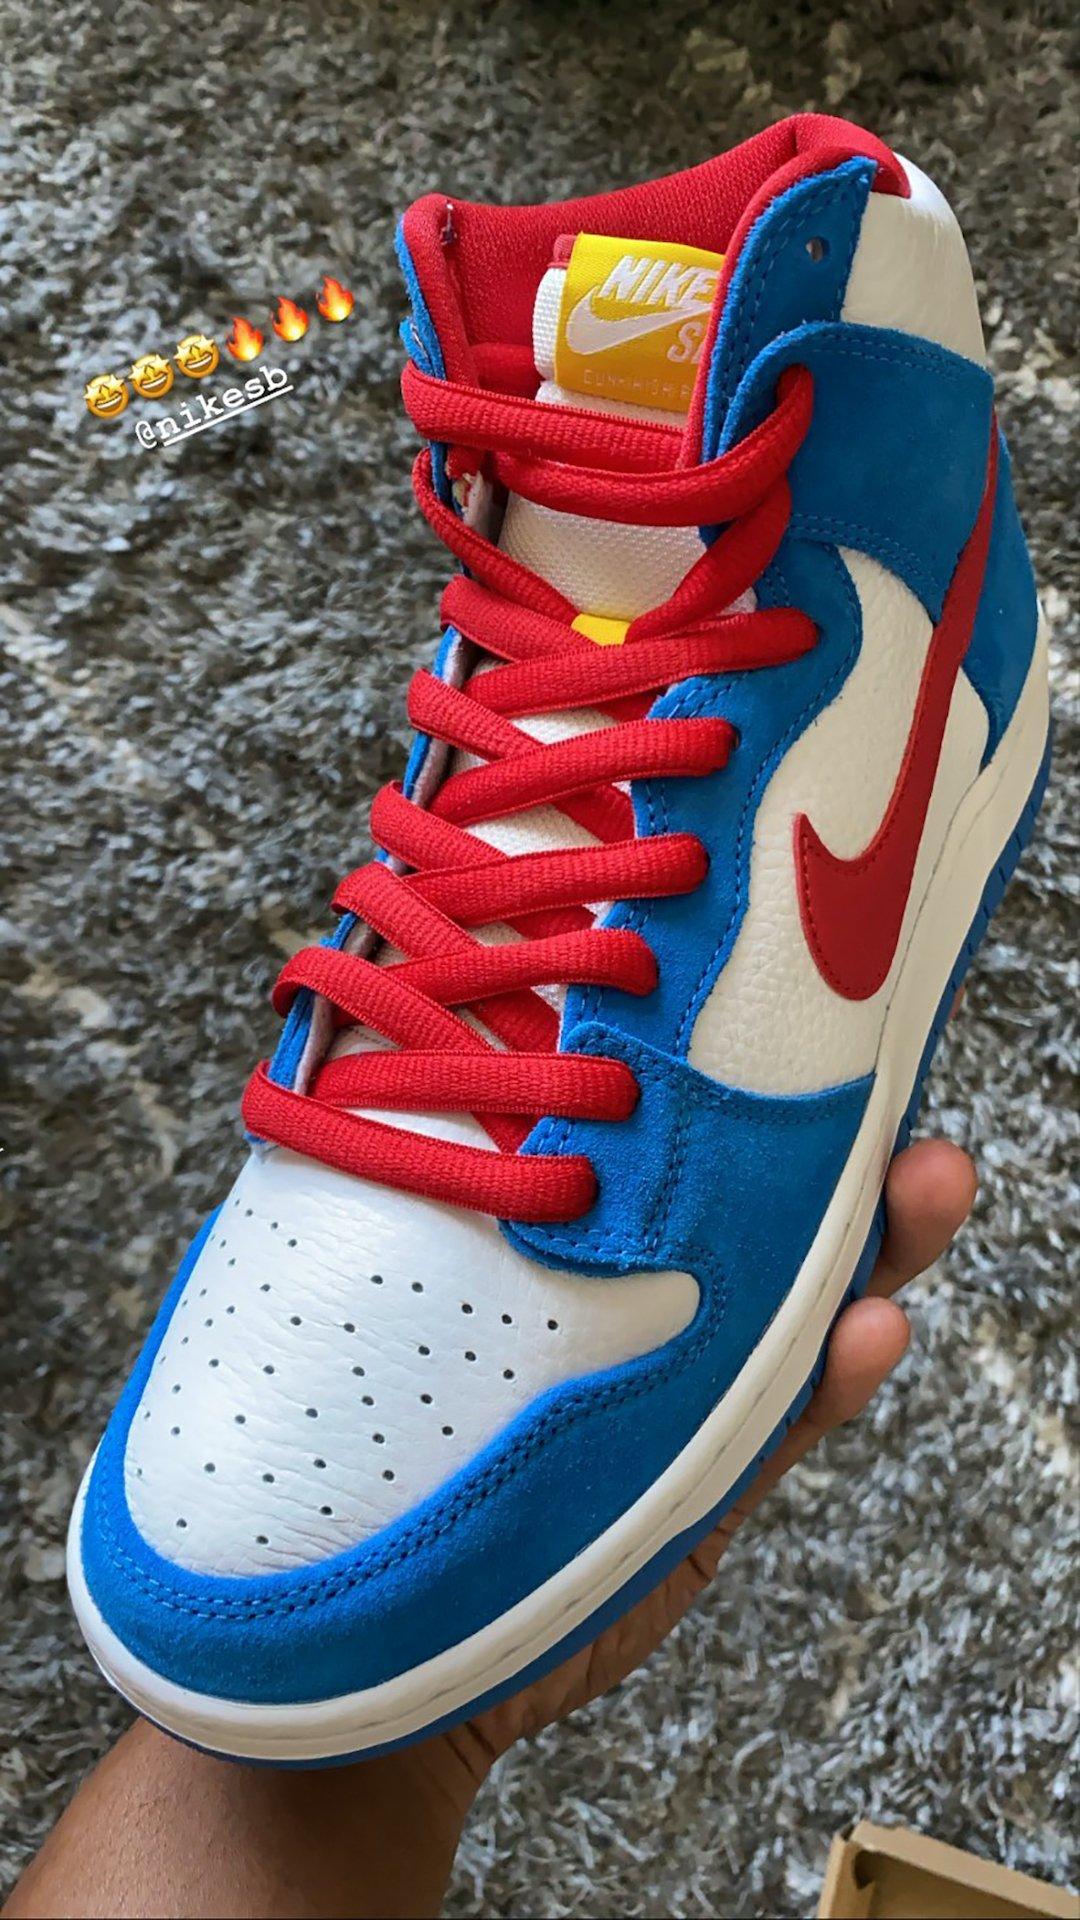 Nike SB Dunk High Doraemon Release Date Info